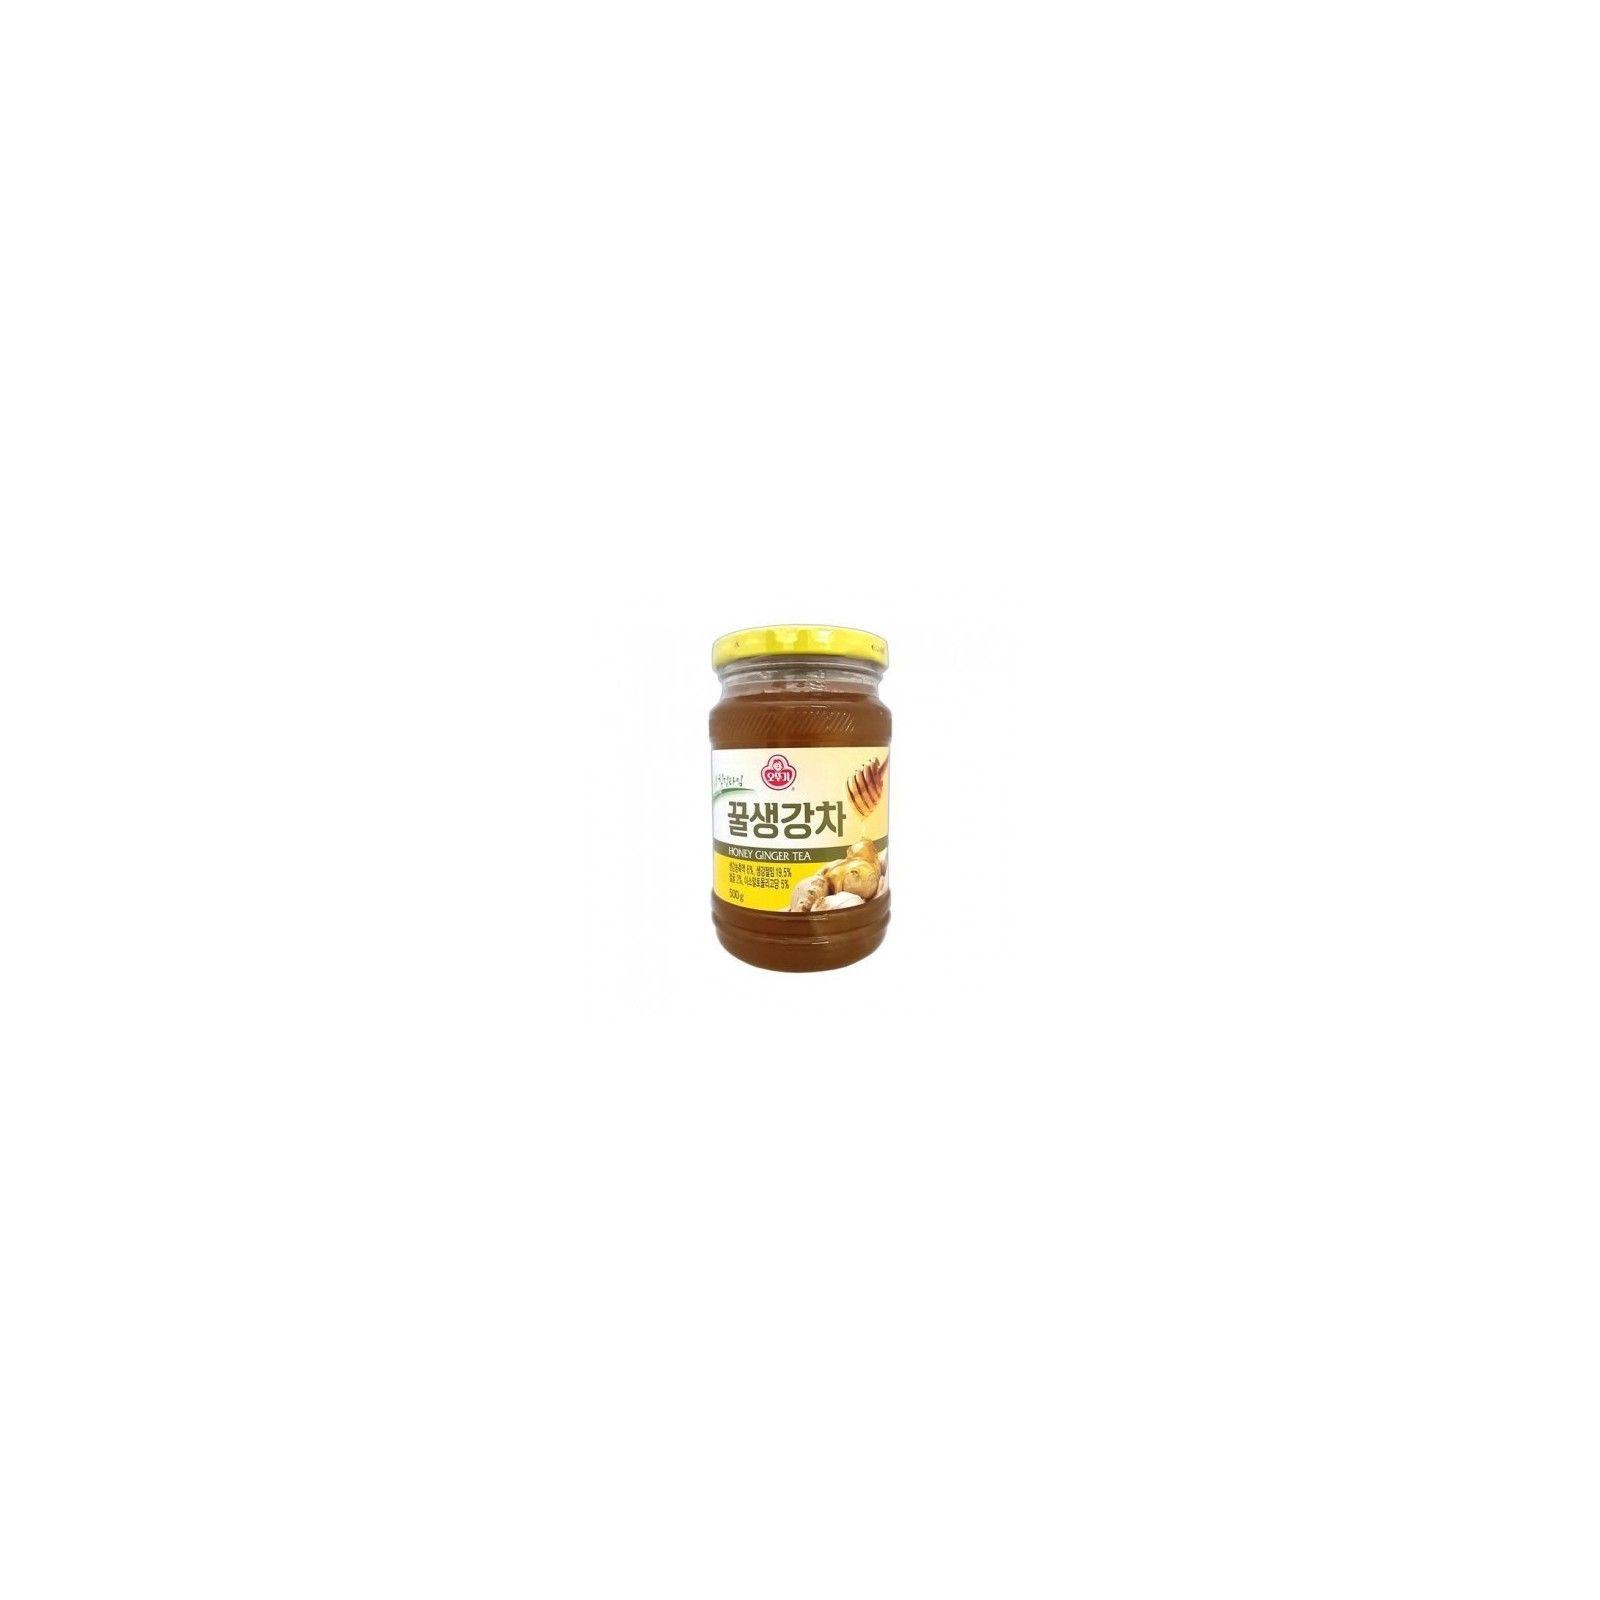 Asia Marché Sirop/Yuja gingembre et miel 500g Ottogi